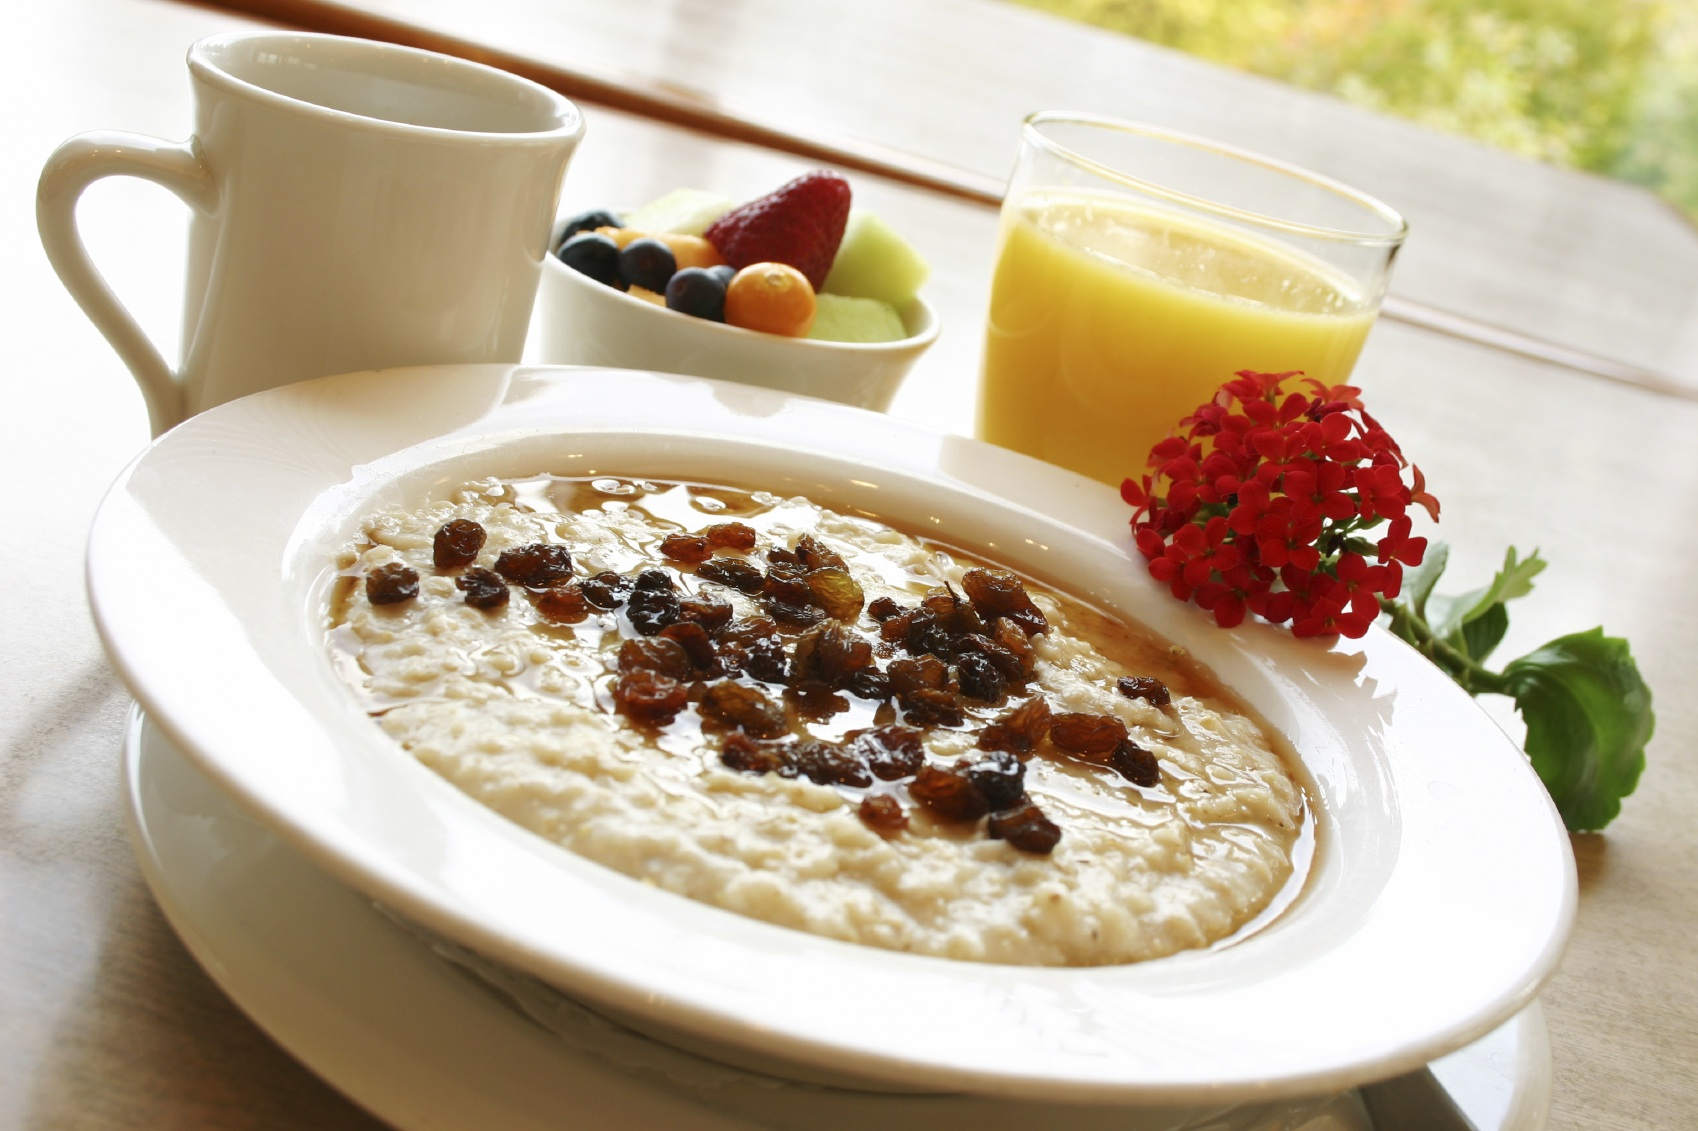 Breakfast Series Oatmeal with raisins